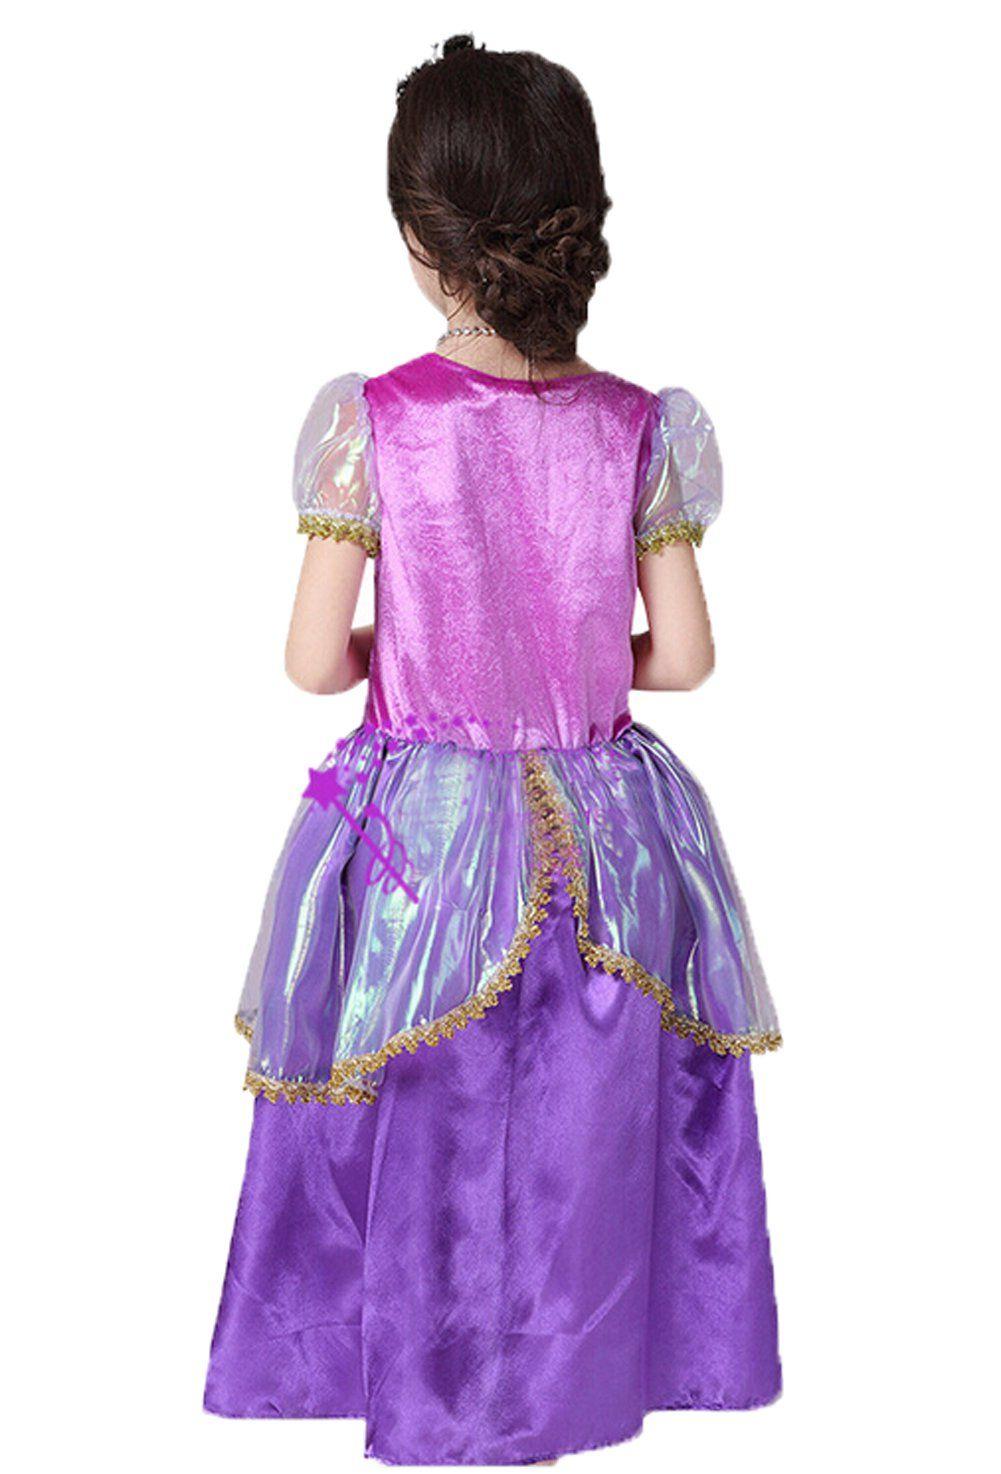 Girls purple new princess dress halloween christmas